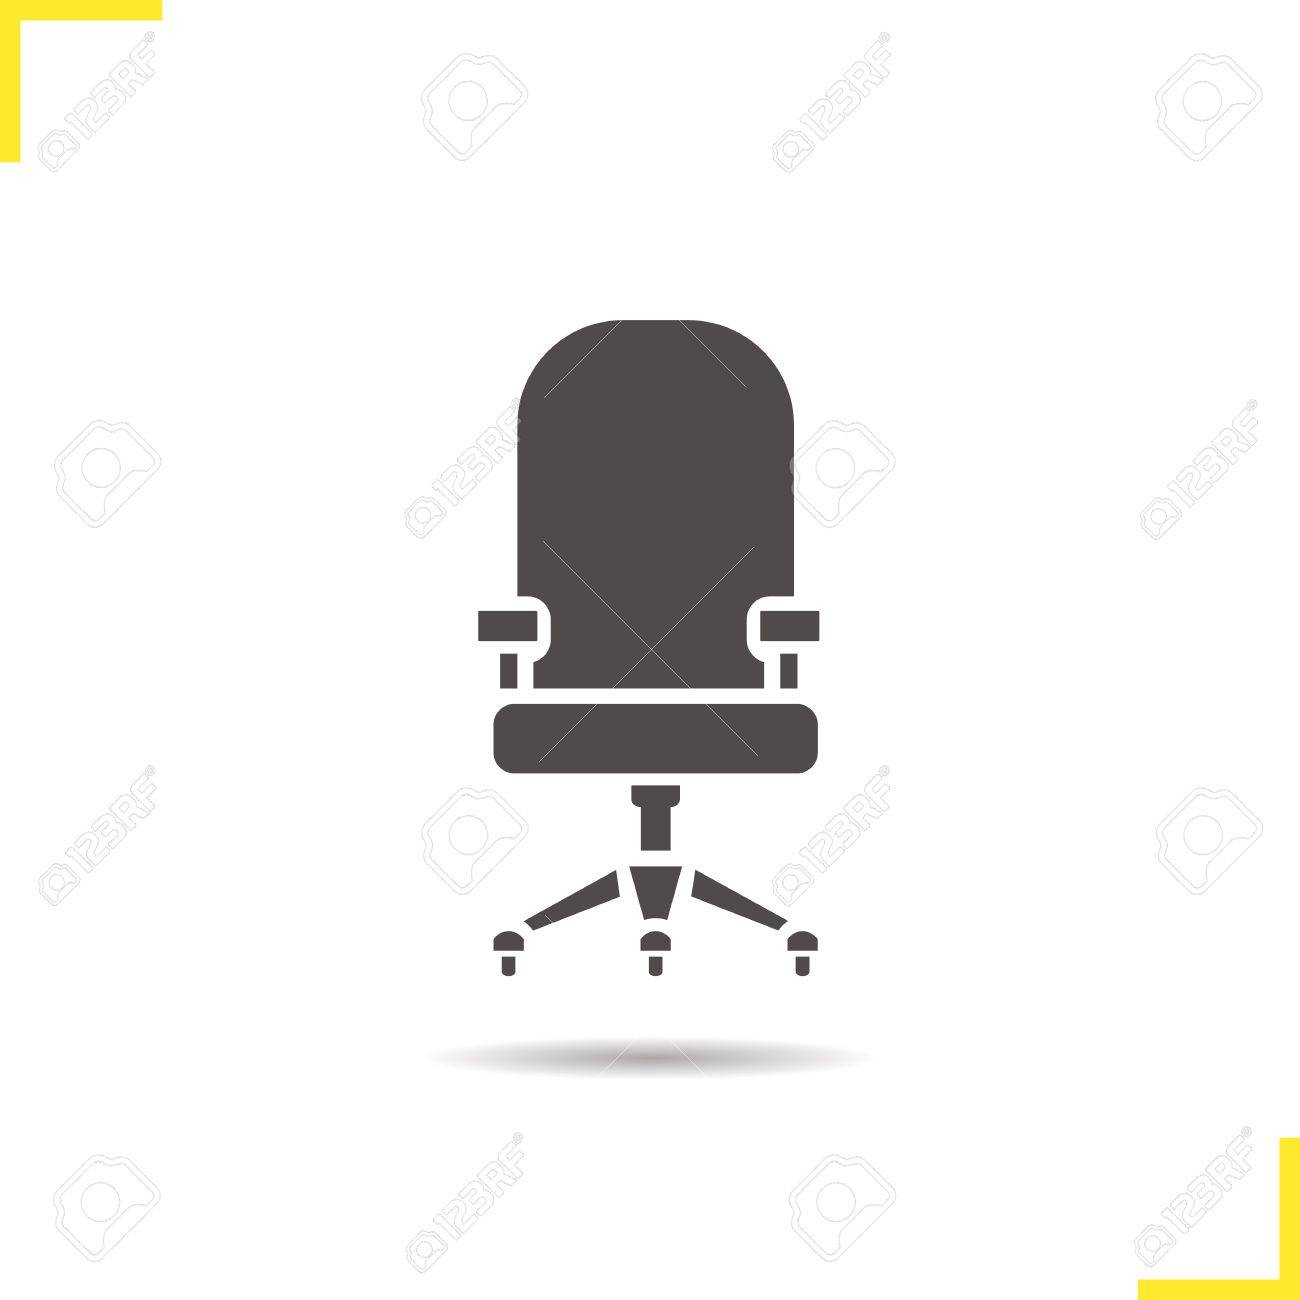 Computer-Stuhl-Symbol. Schlagschatten Bürostuhl Silhouette Symbol ...